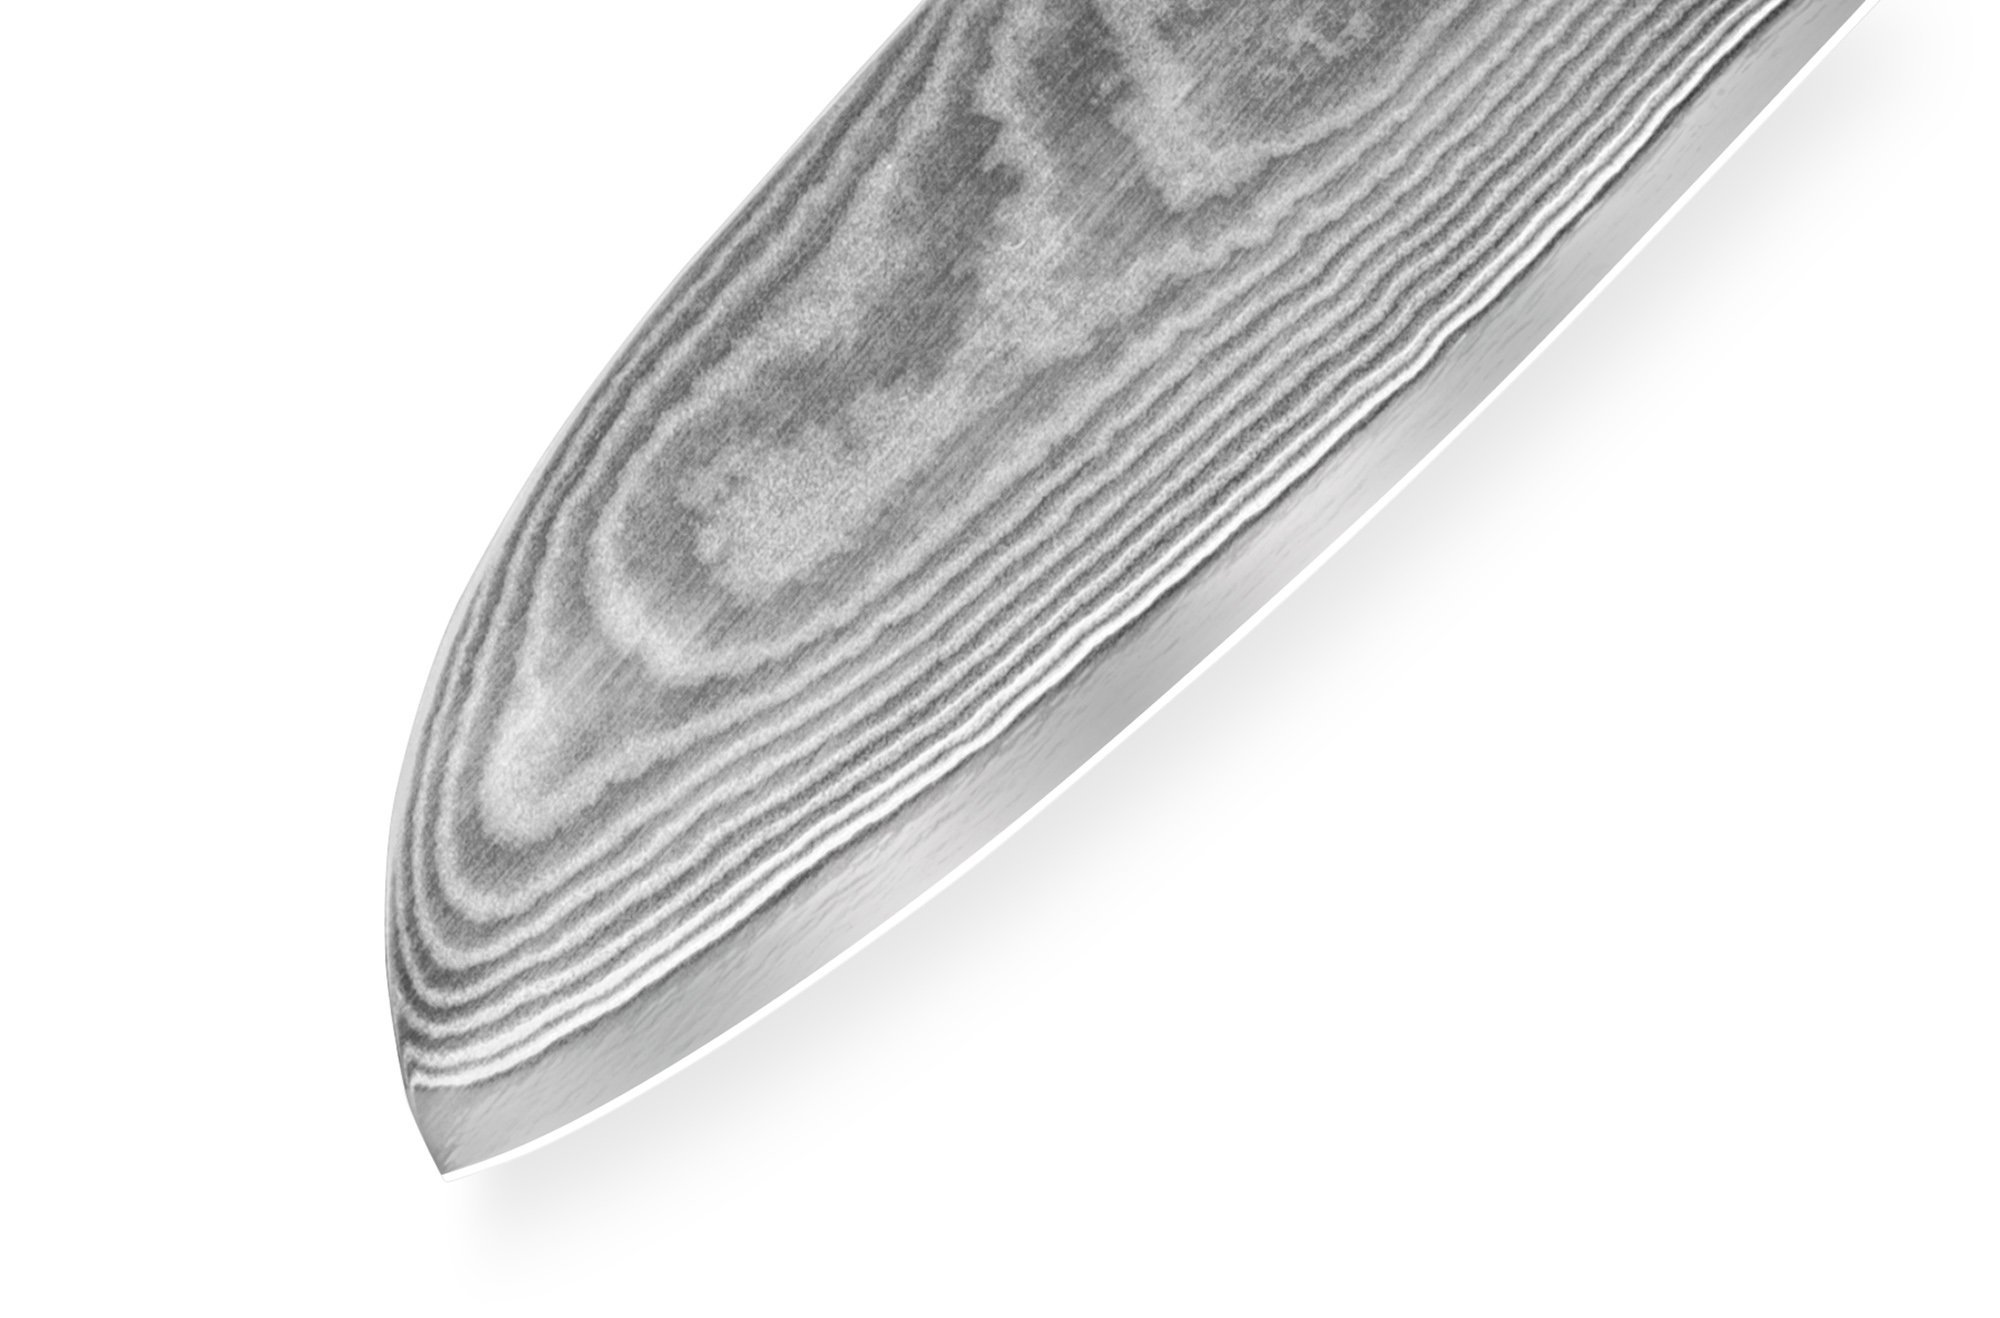 Фото 9 - Нож кухонный Сантоку Samura Damascus SD-0092/Y, сталь VG-10/дамаск, рукоять G-10